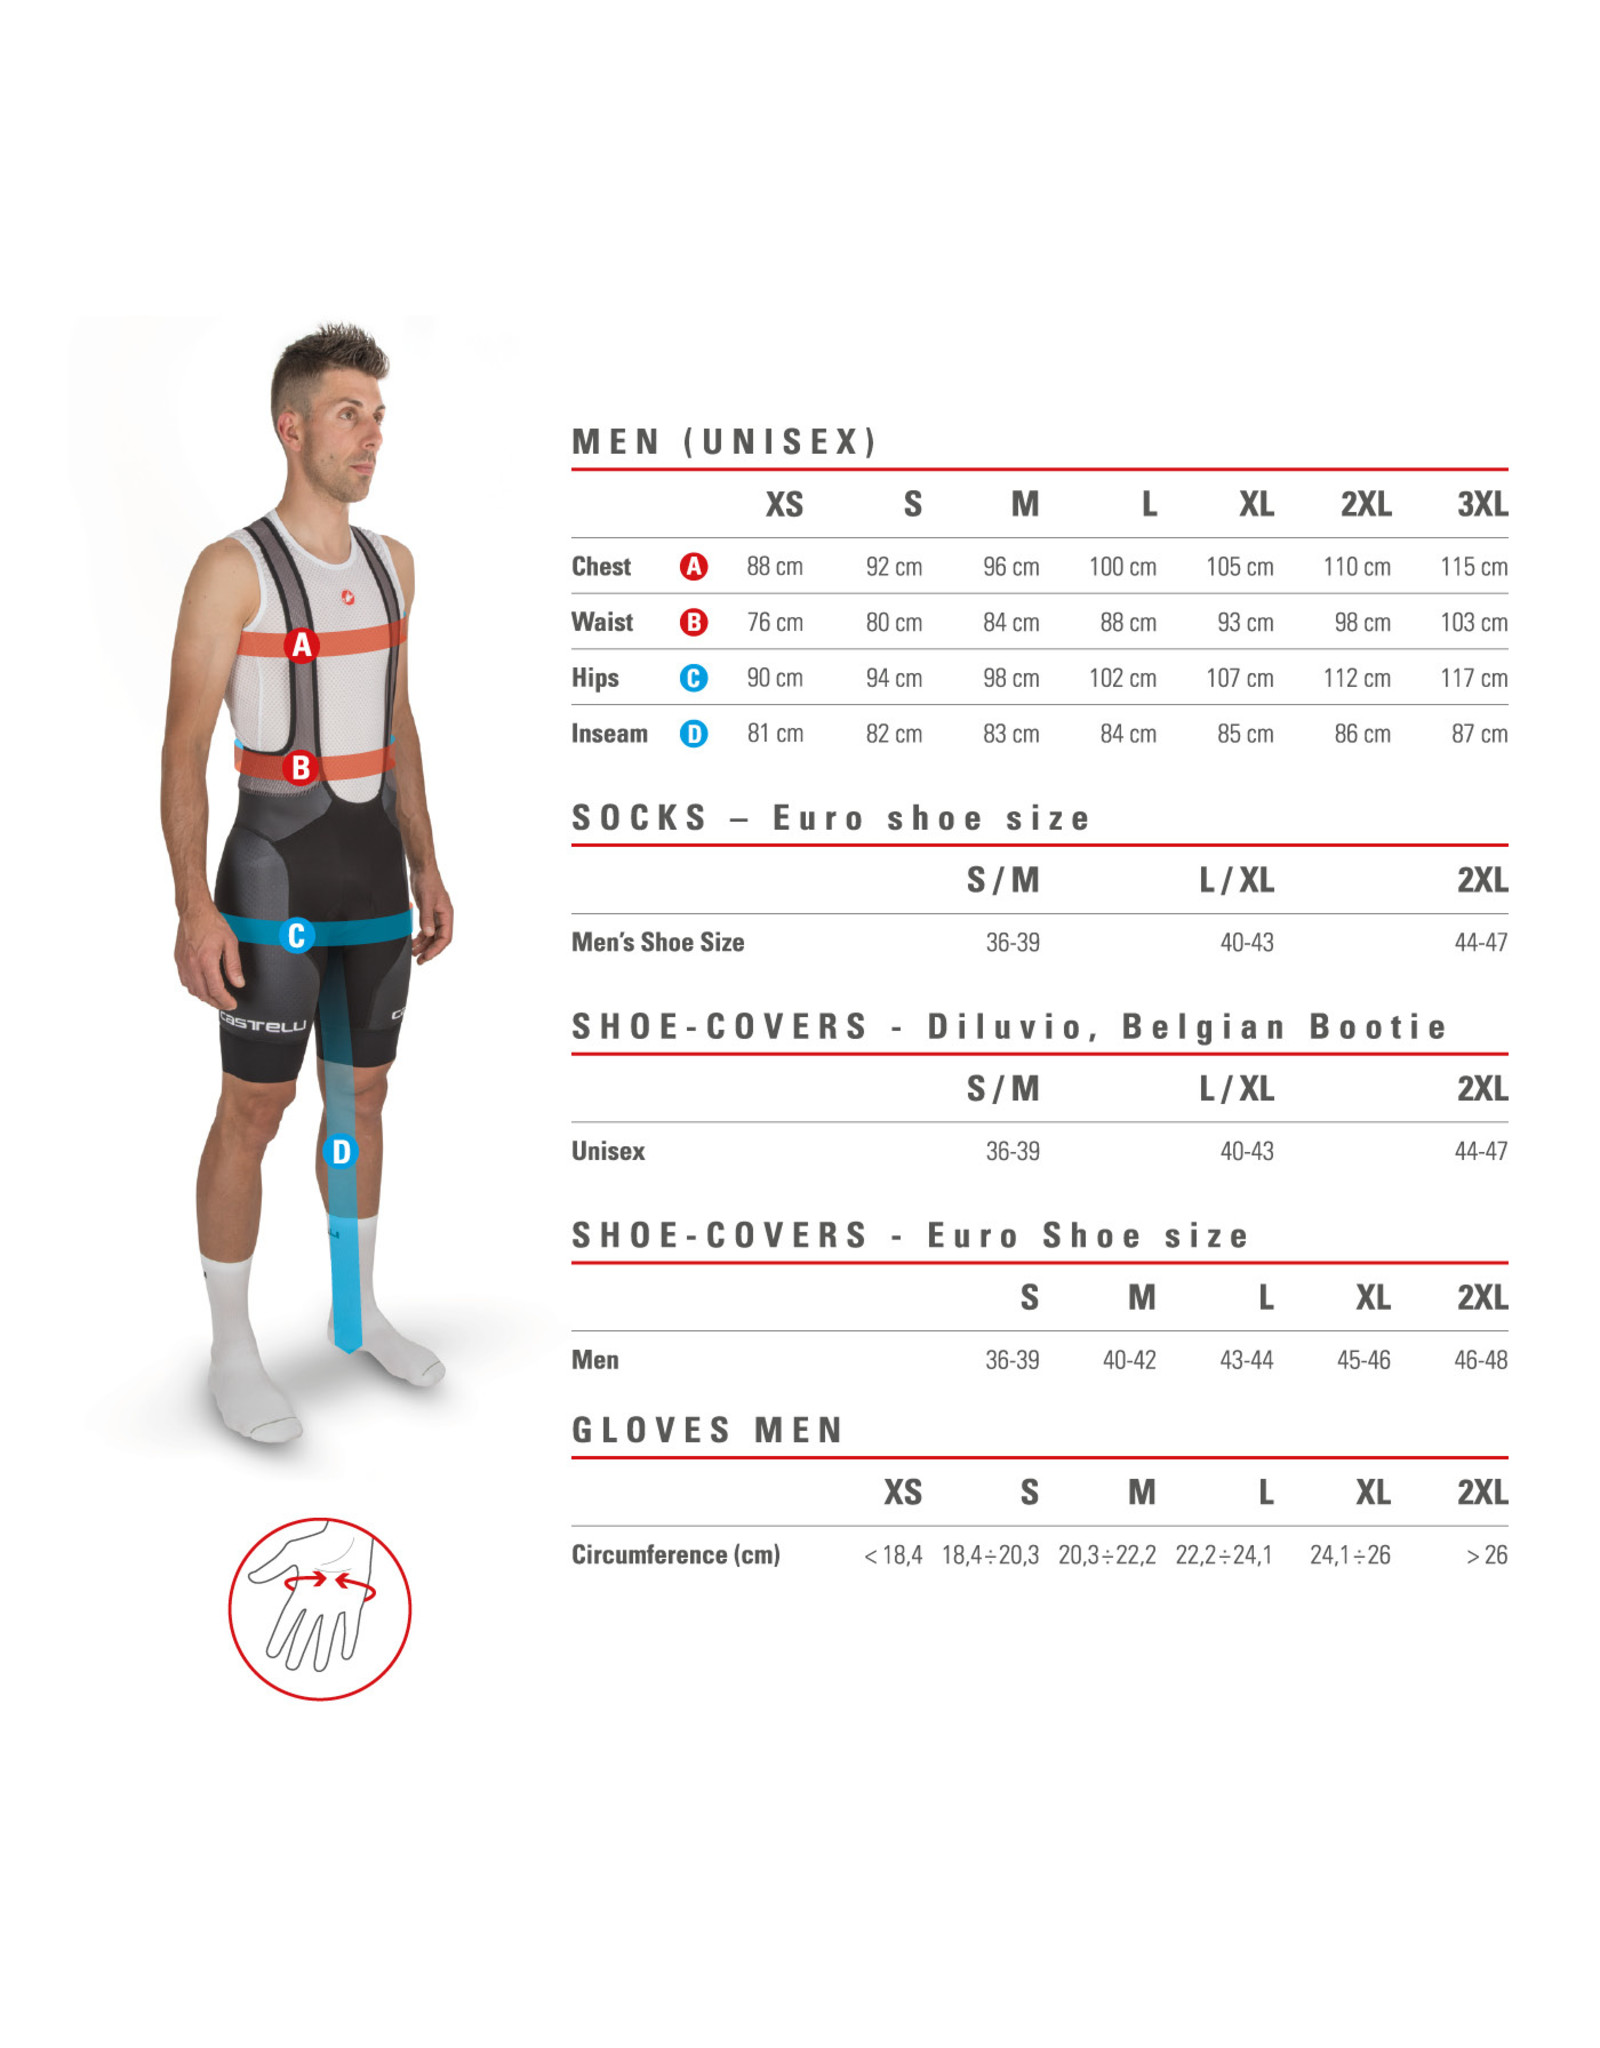 Castelli '21, CASTELLI, Endurance 3 Short, Men's